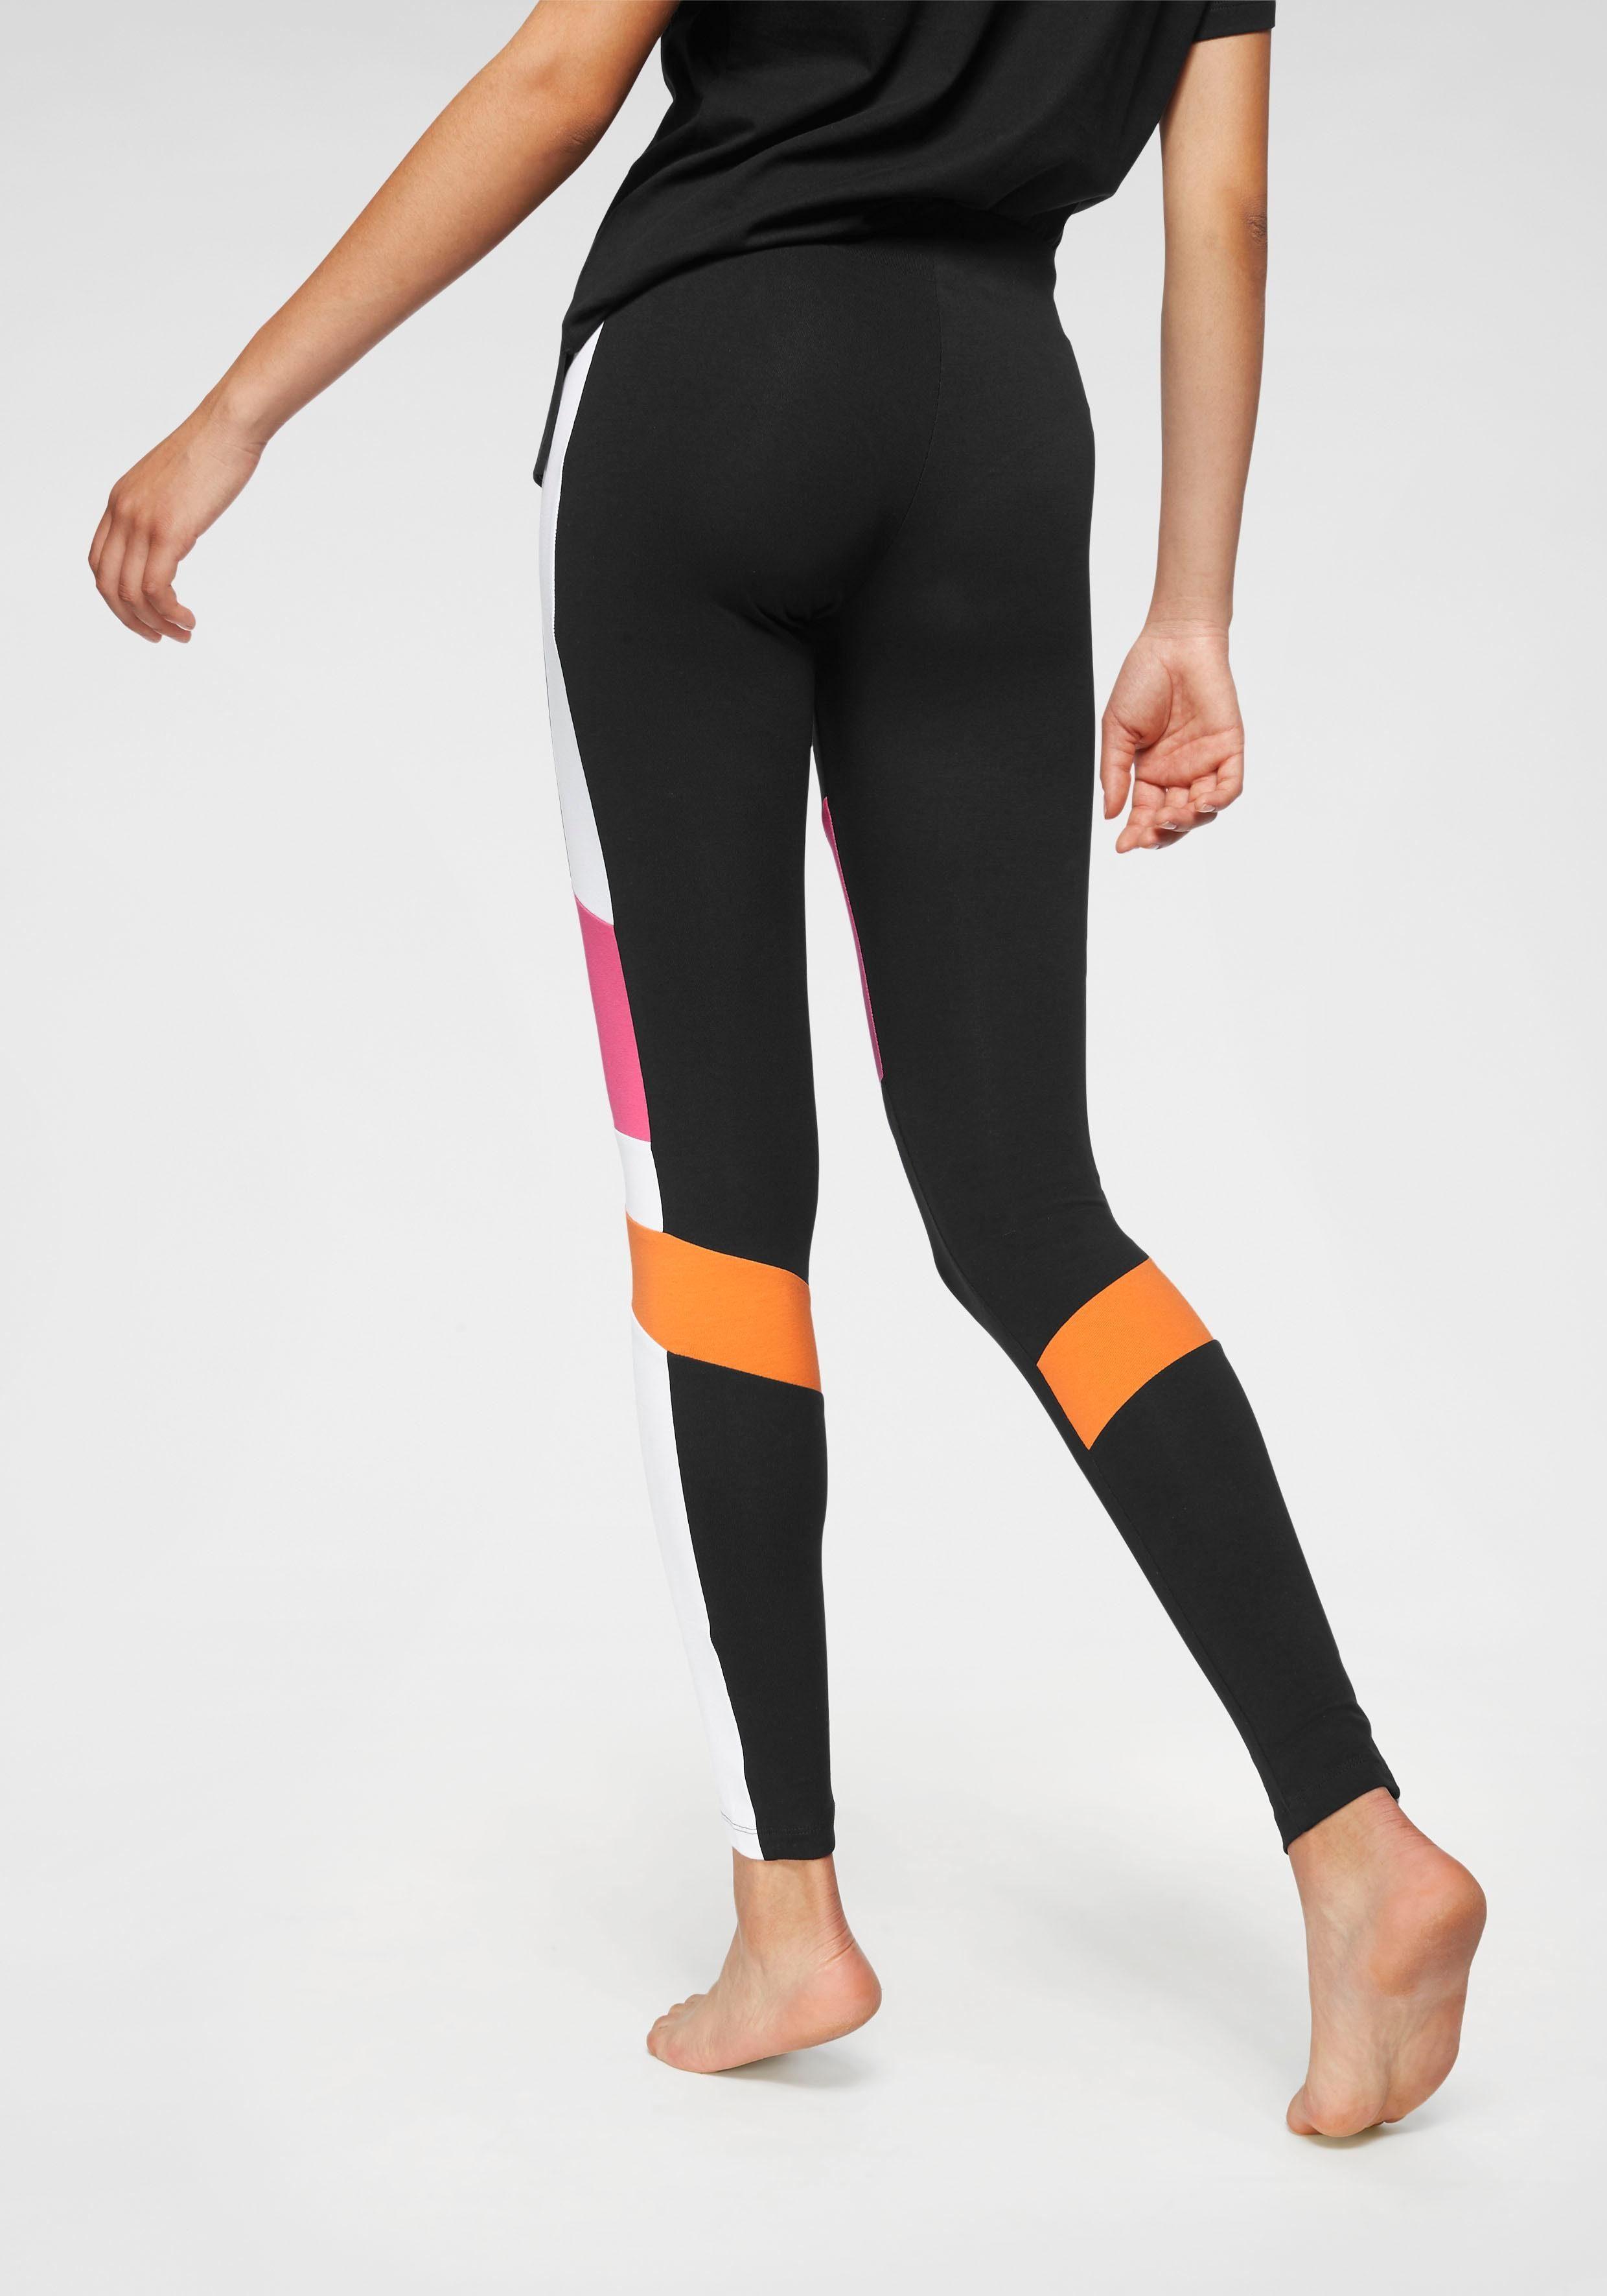 PUMA Leggings TFS Legging Wäsche & Bademode/Damenwäsche/Leggings